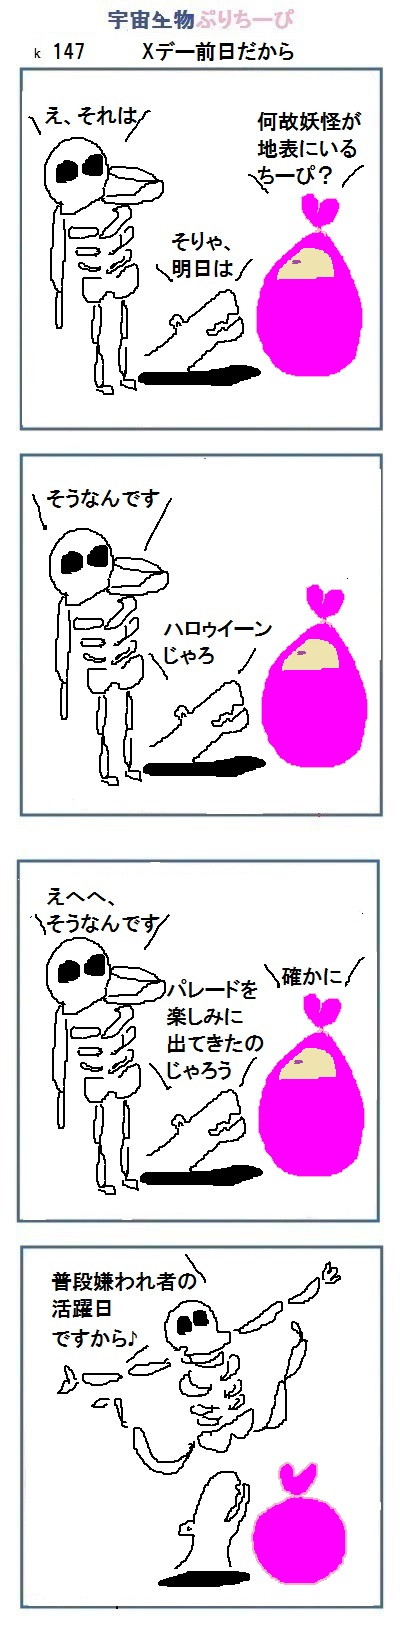 161030_k147.jpg